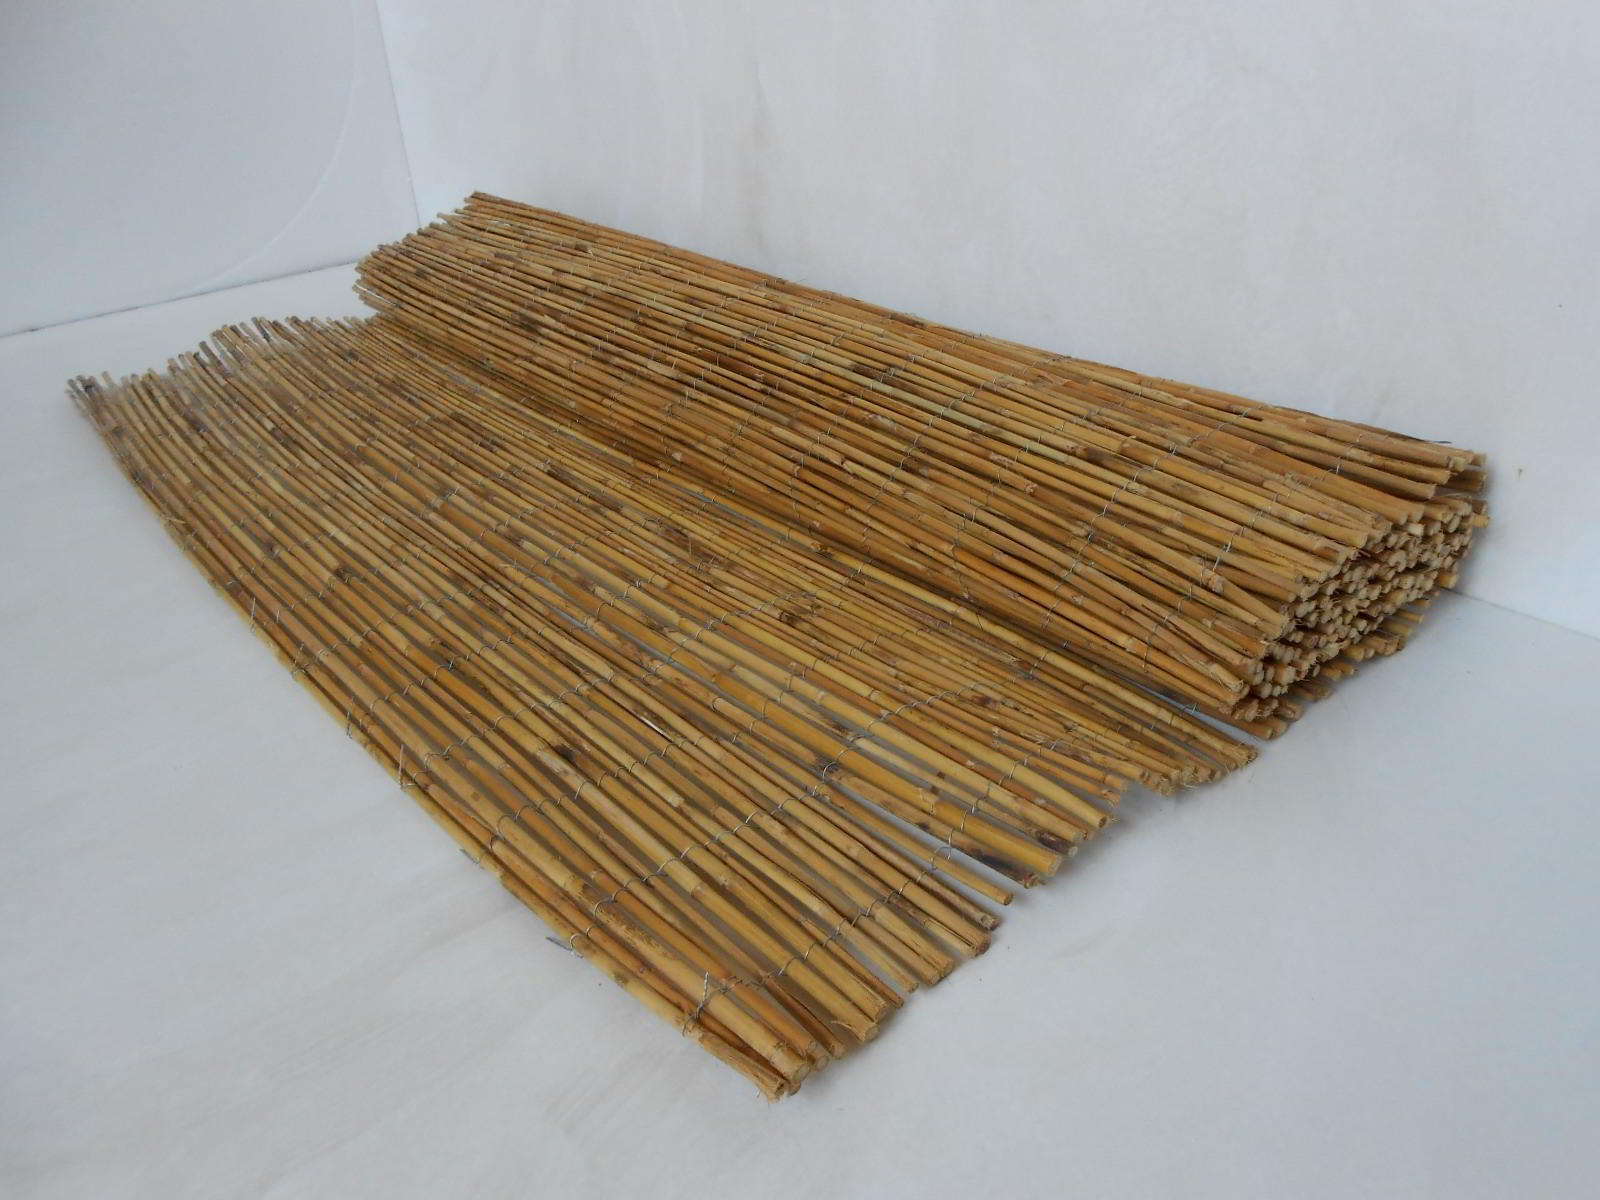 Arelle In Bambù Arelle Di Bambu Canne Di Bamboo Stuoie Bambu Recinzioni In Bambù Cannicci Coperture Per Esterno Pannelli Di Bambu Mantova